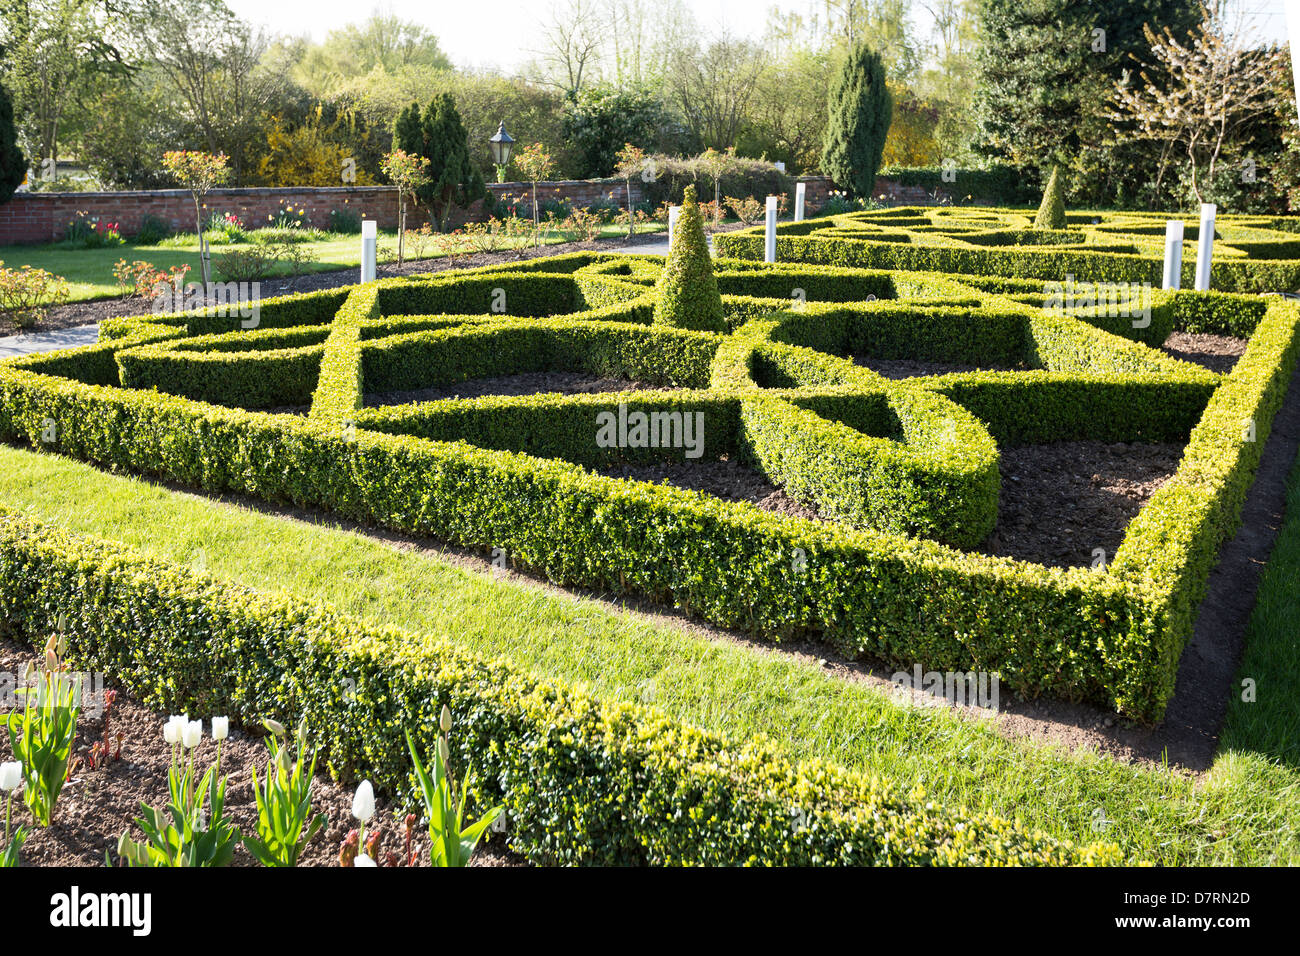 Formal box hedging  in ornamental design  in Stratford Warwickshire England - Stock Image